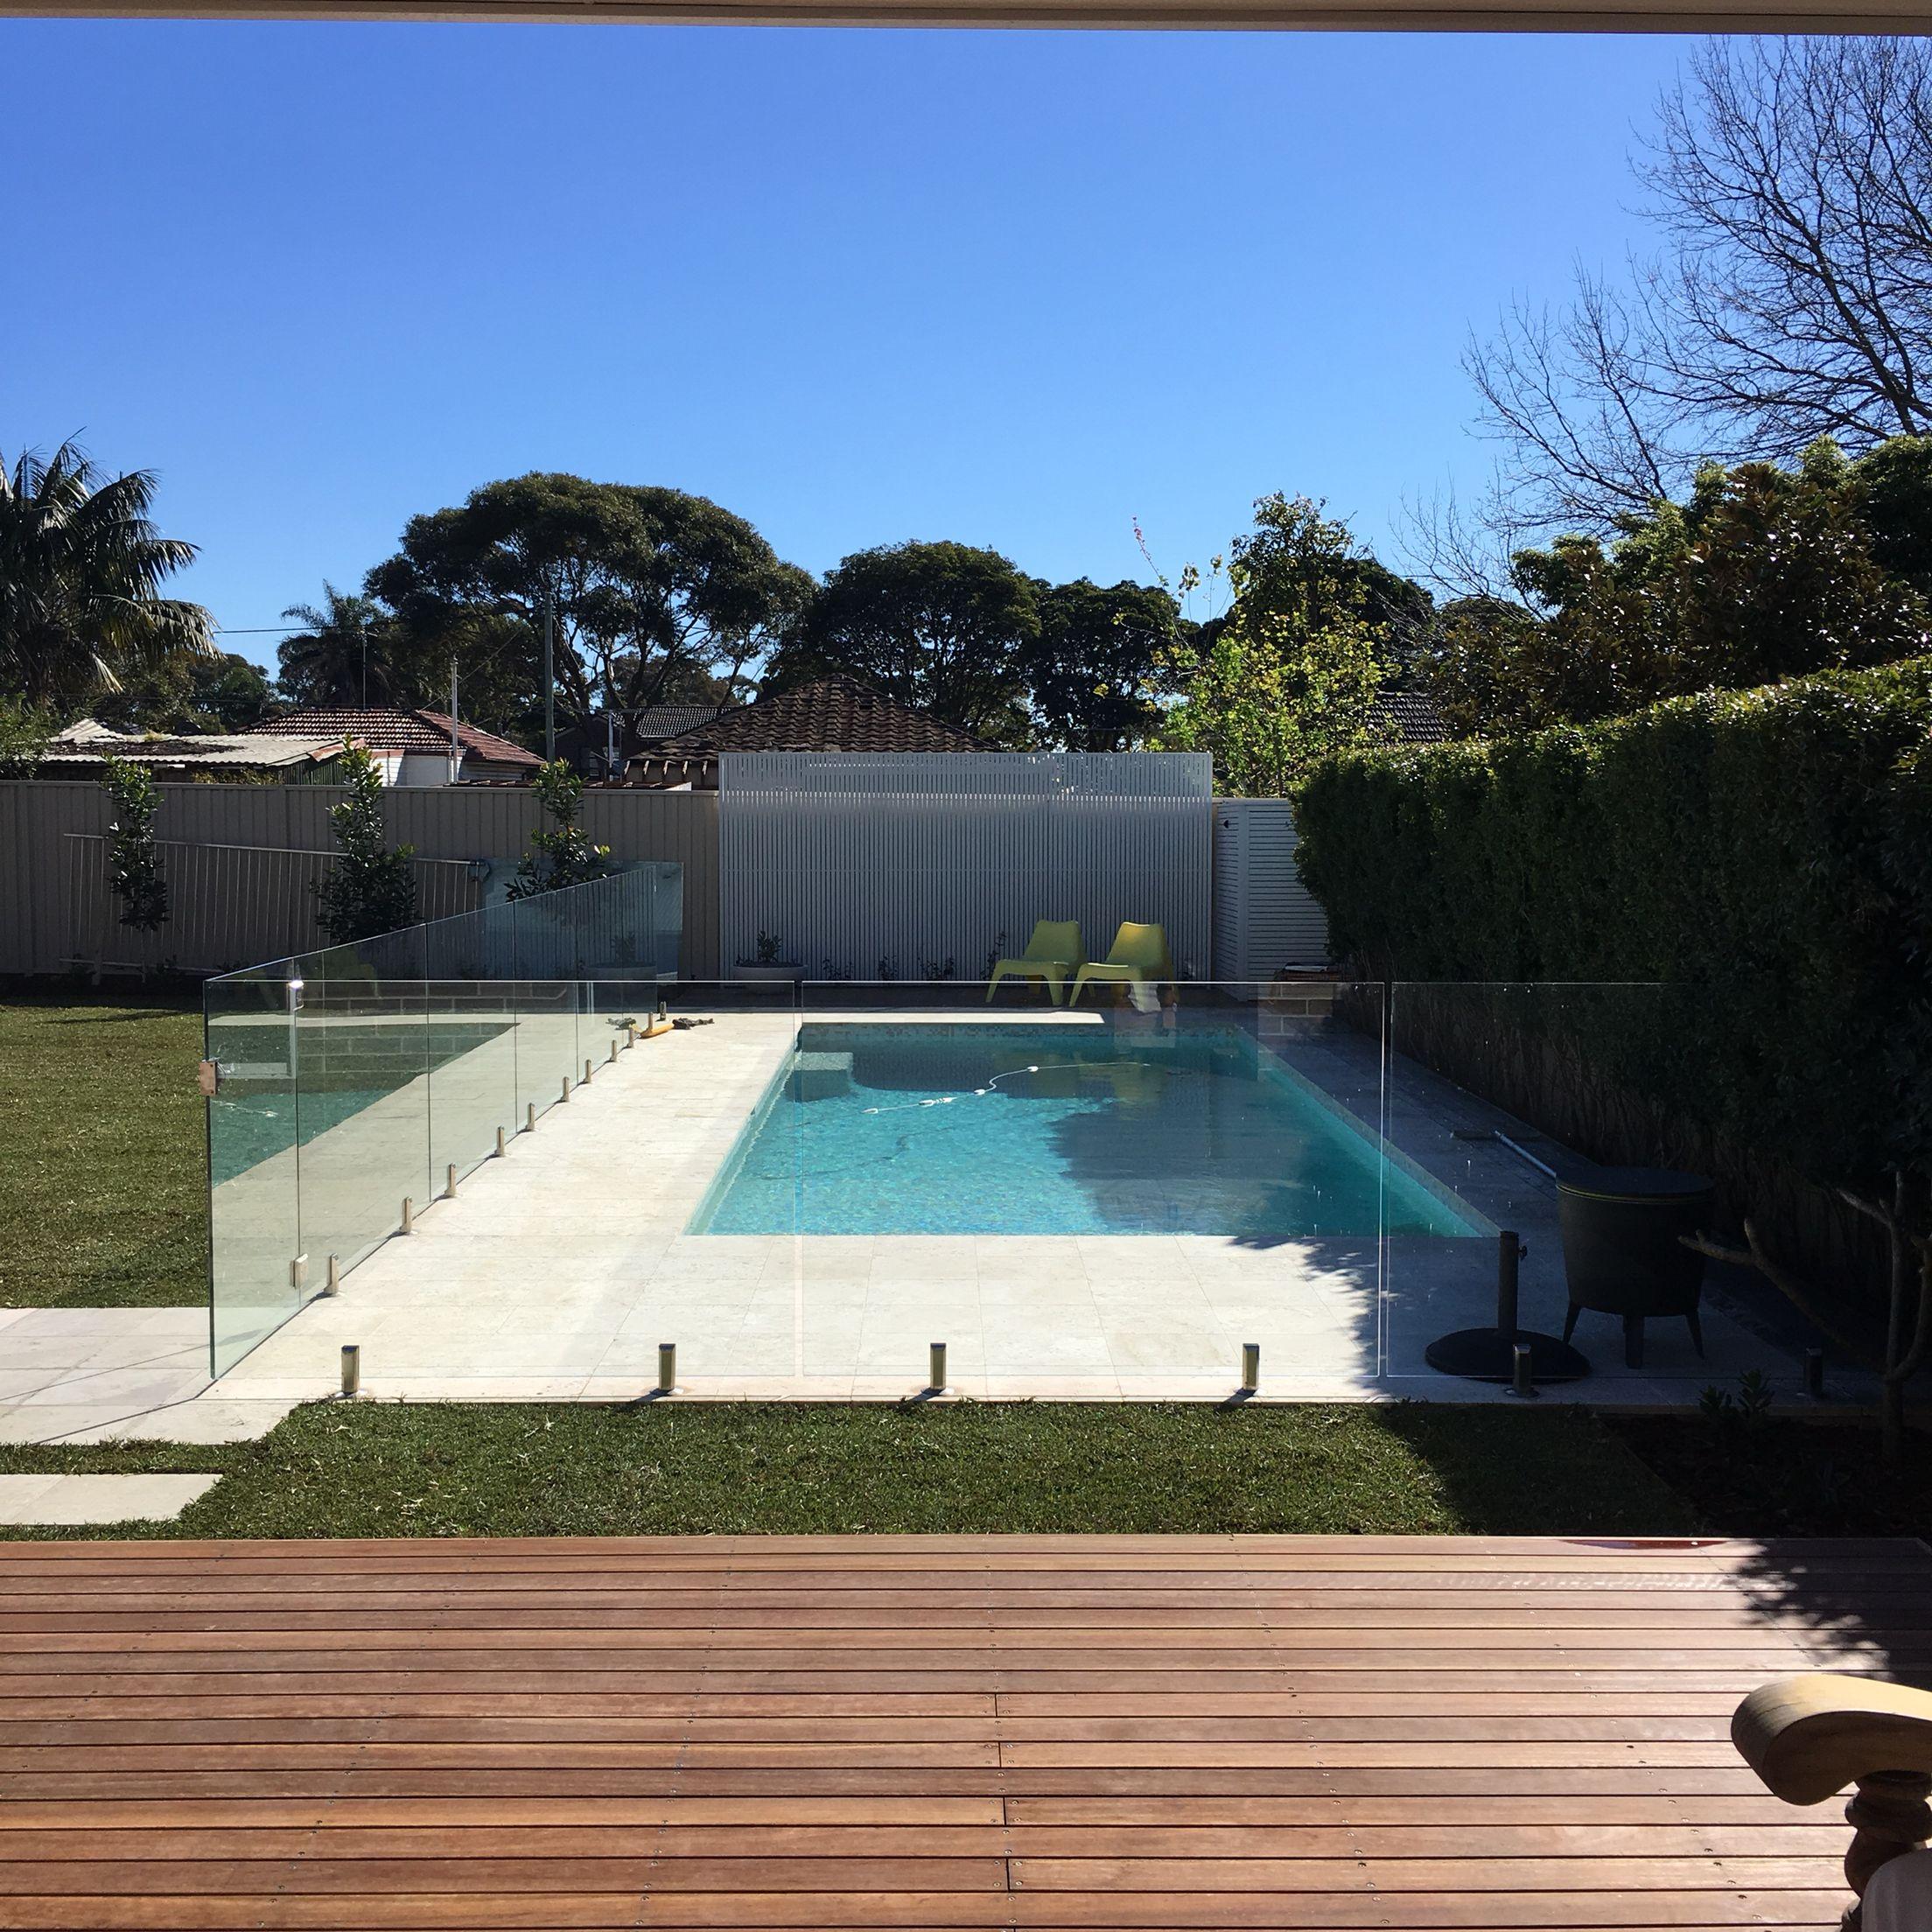 Pool Perfection The Great Australian Backyard Needs A Perfect Pool Like This Travertine Pavers White Slat Travertine Pool Decking Travertine Pool Backyard